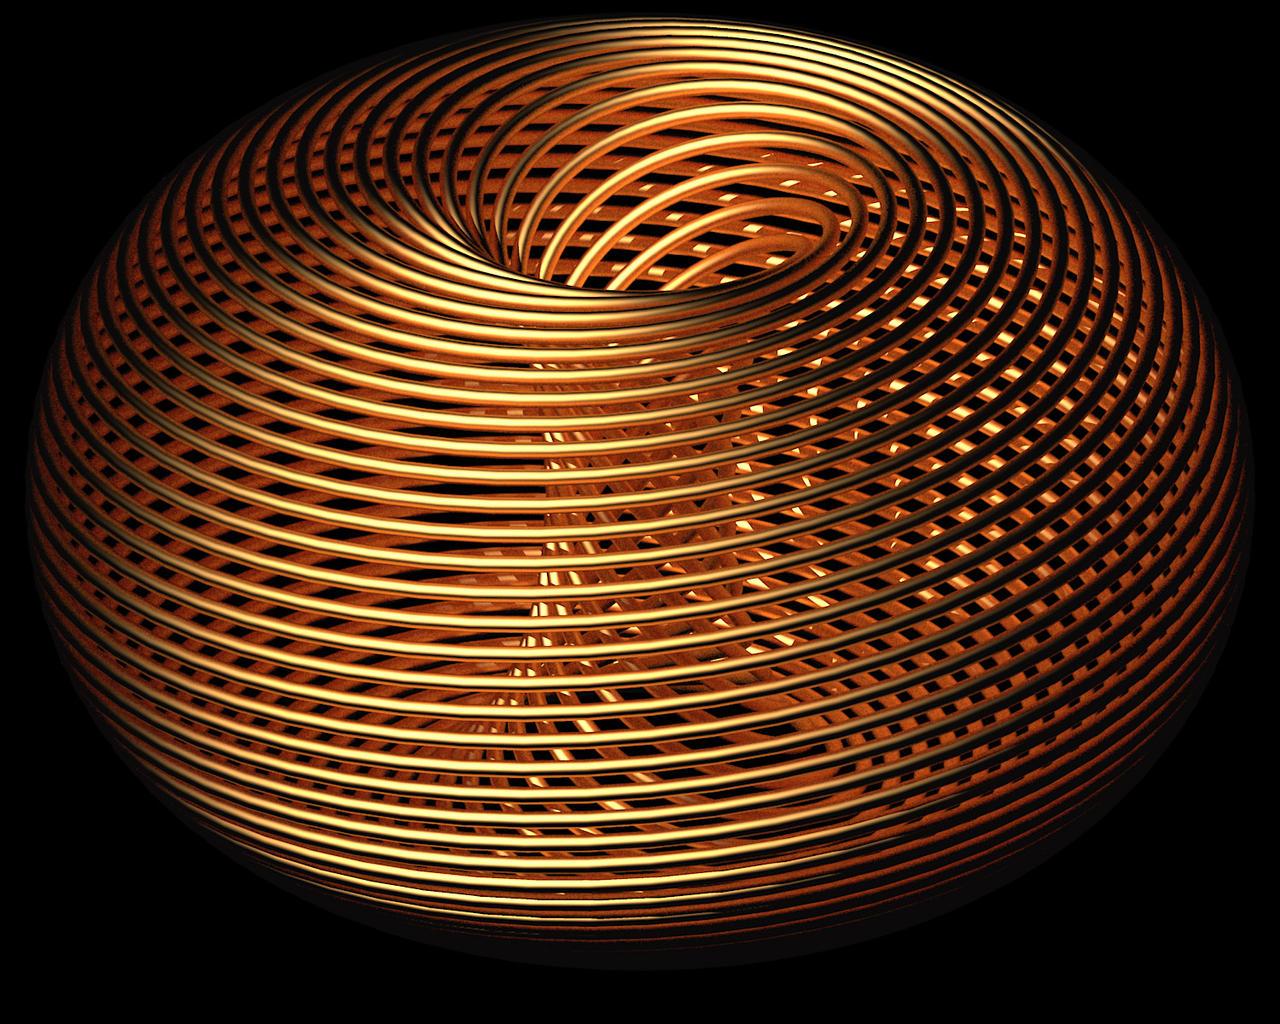 Spiral Torus by TaffGoch